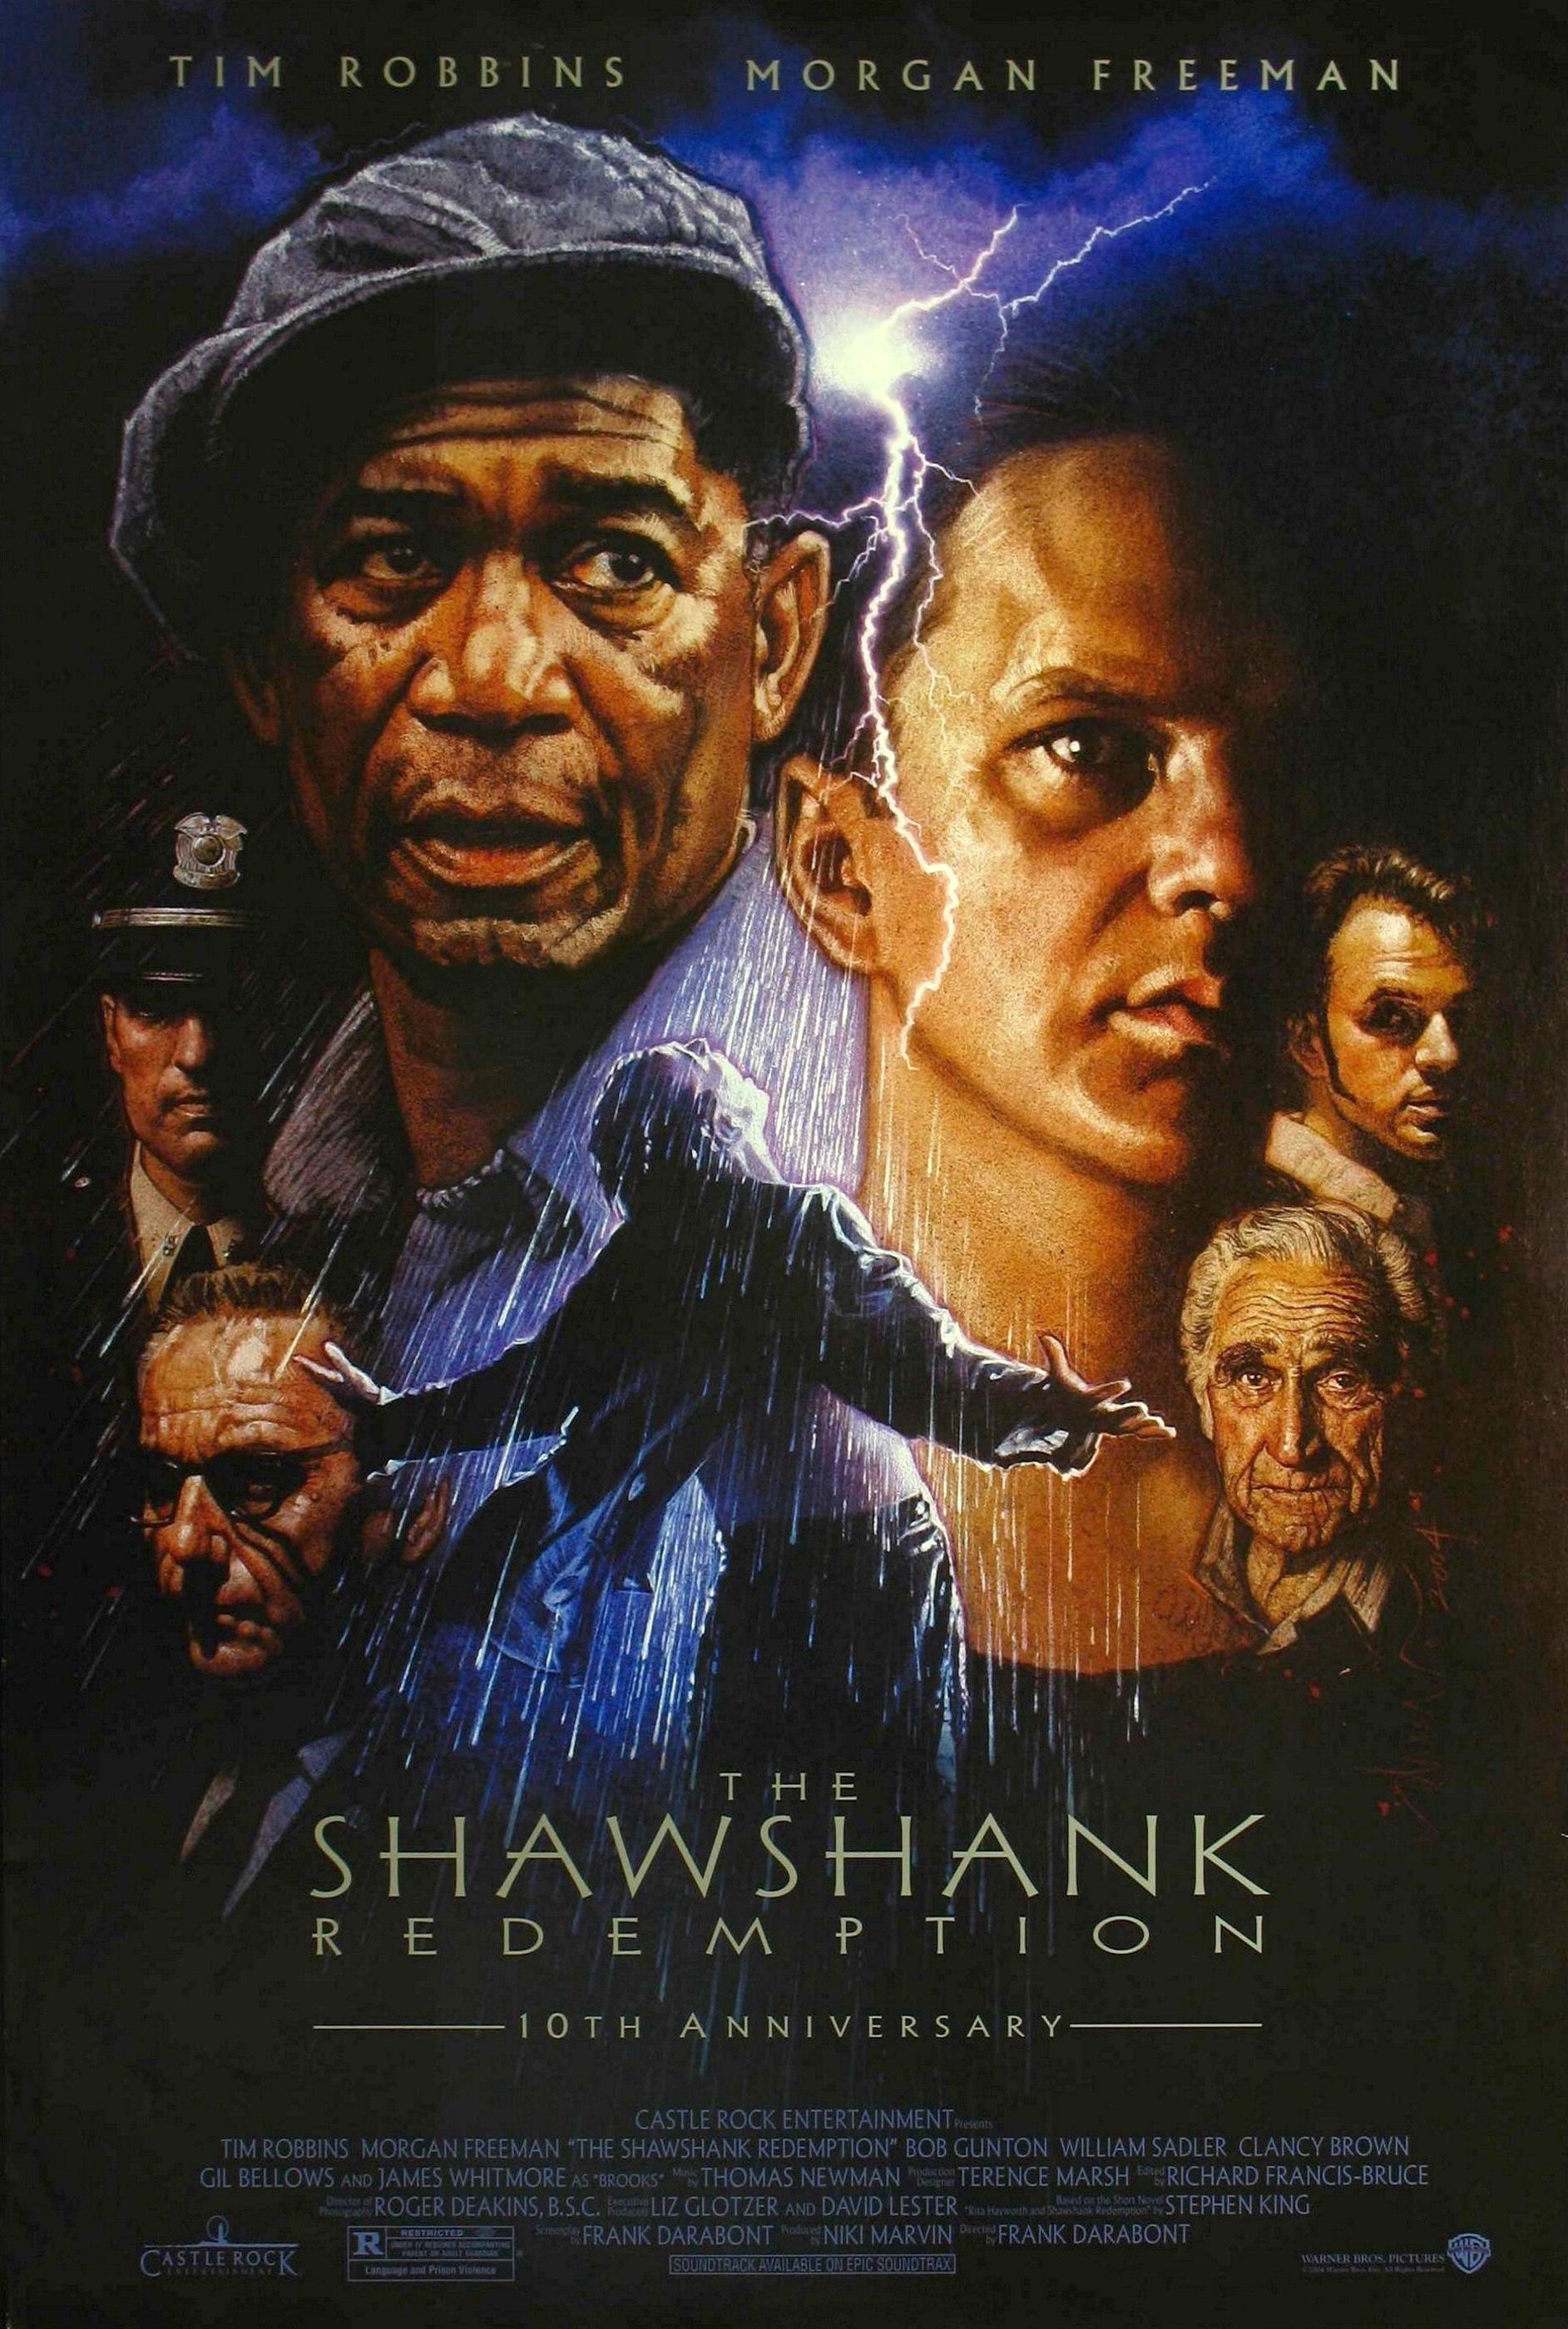 Morgan Freeman, Tim Robbins, Clancy Brown, Gil Bellows, William Sadler, Bob Gunton, and James Whitmore in The Shawshank Redemption (1994)